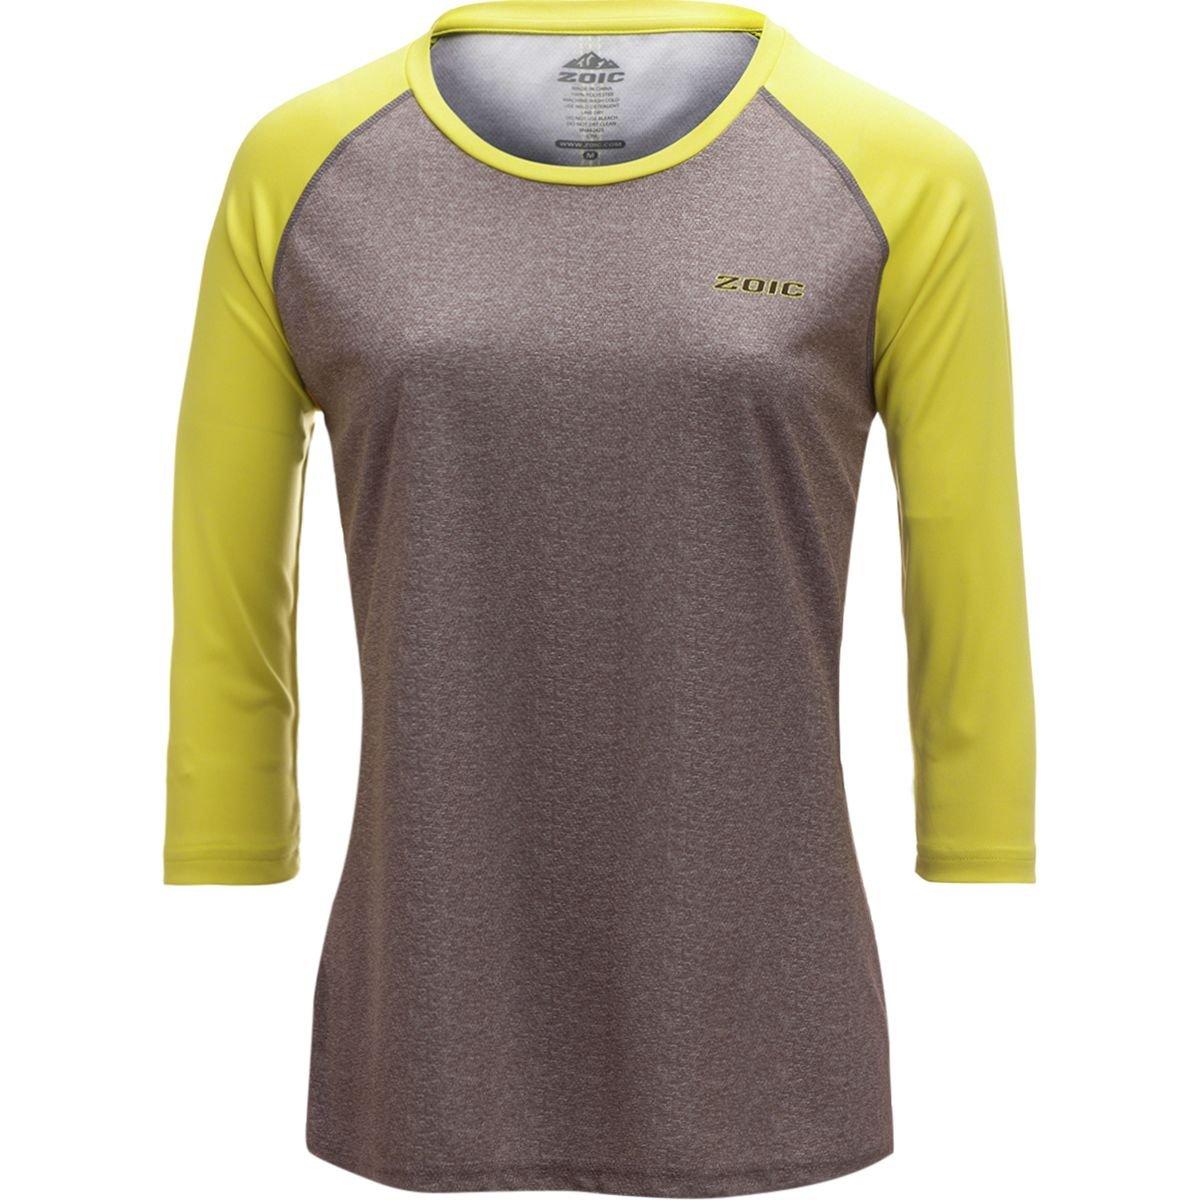 Zoic Jerra Jersey – Women 's B07CRS726H X-Large|Grey Alloy Grey Alloy X-Large